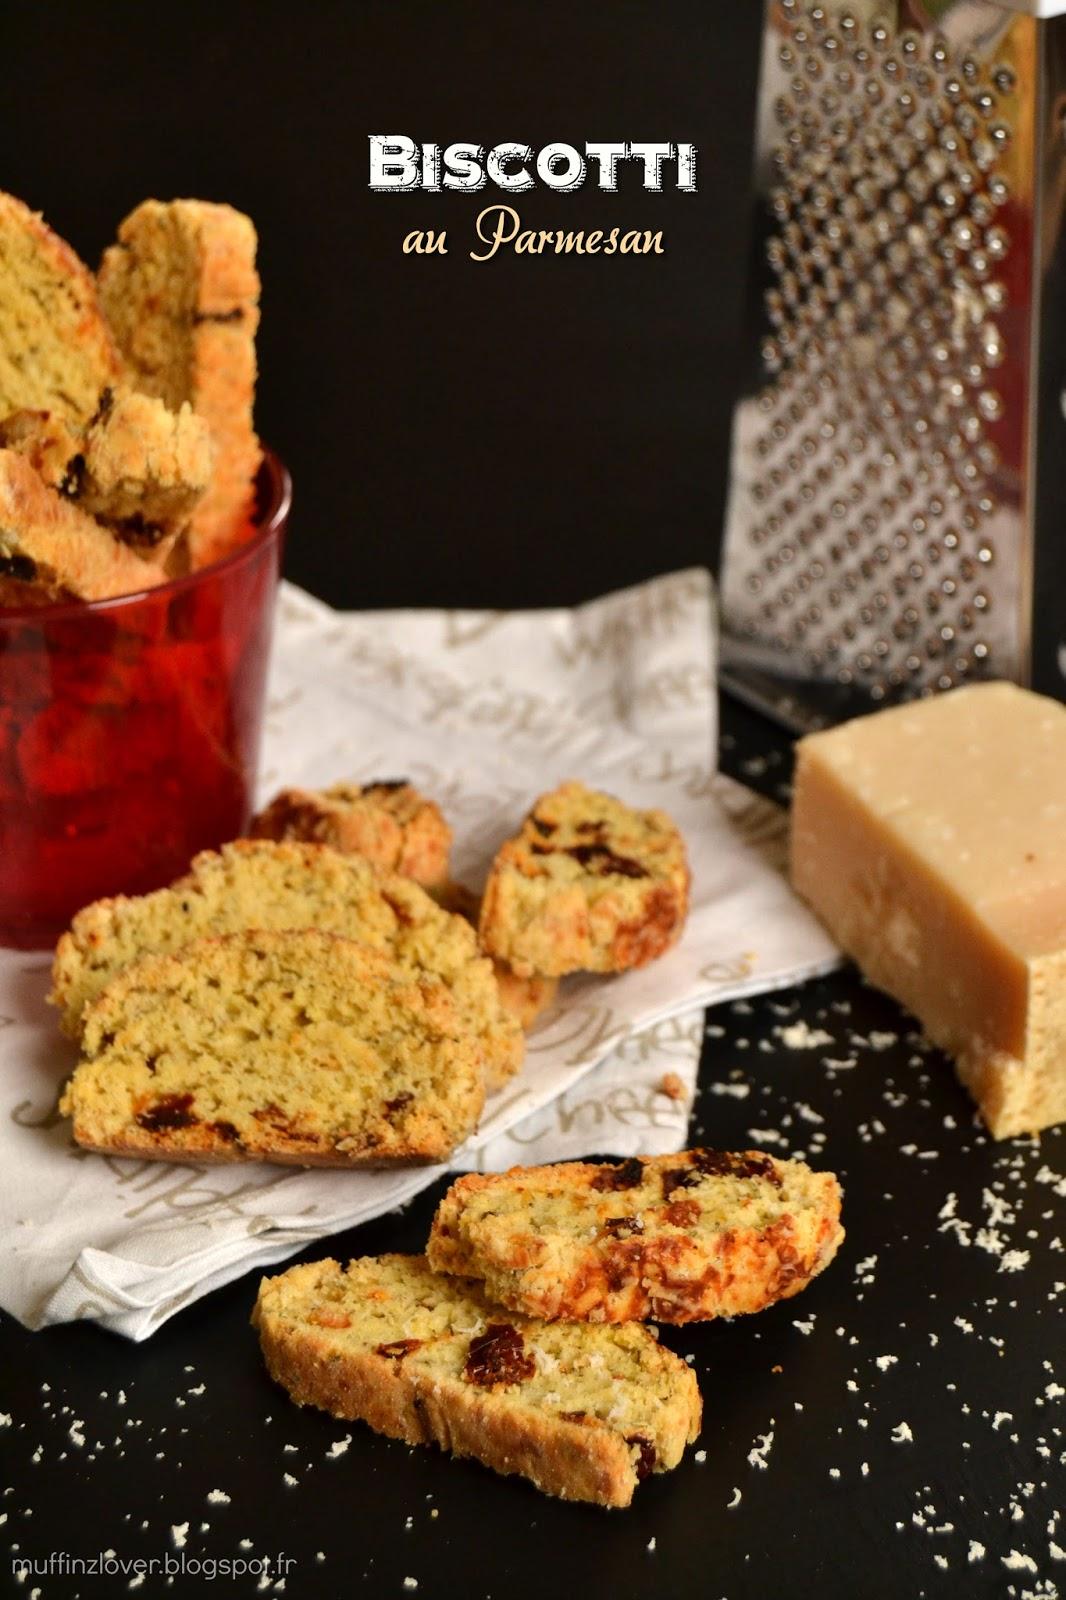 Recette Biscotti Parmesan - muffinzlover.blogspot.fr